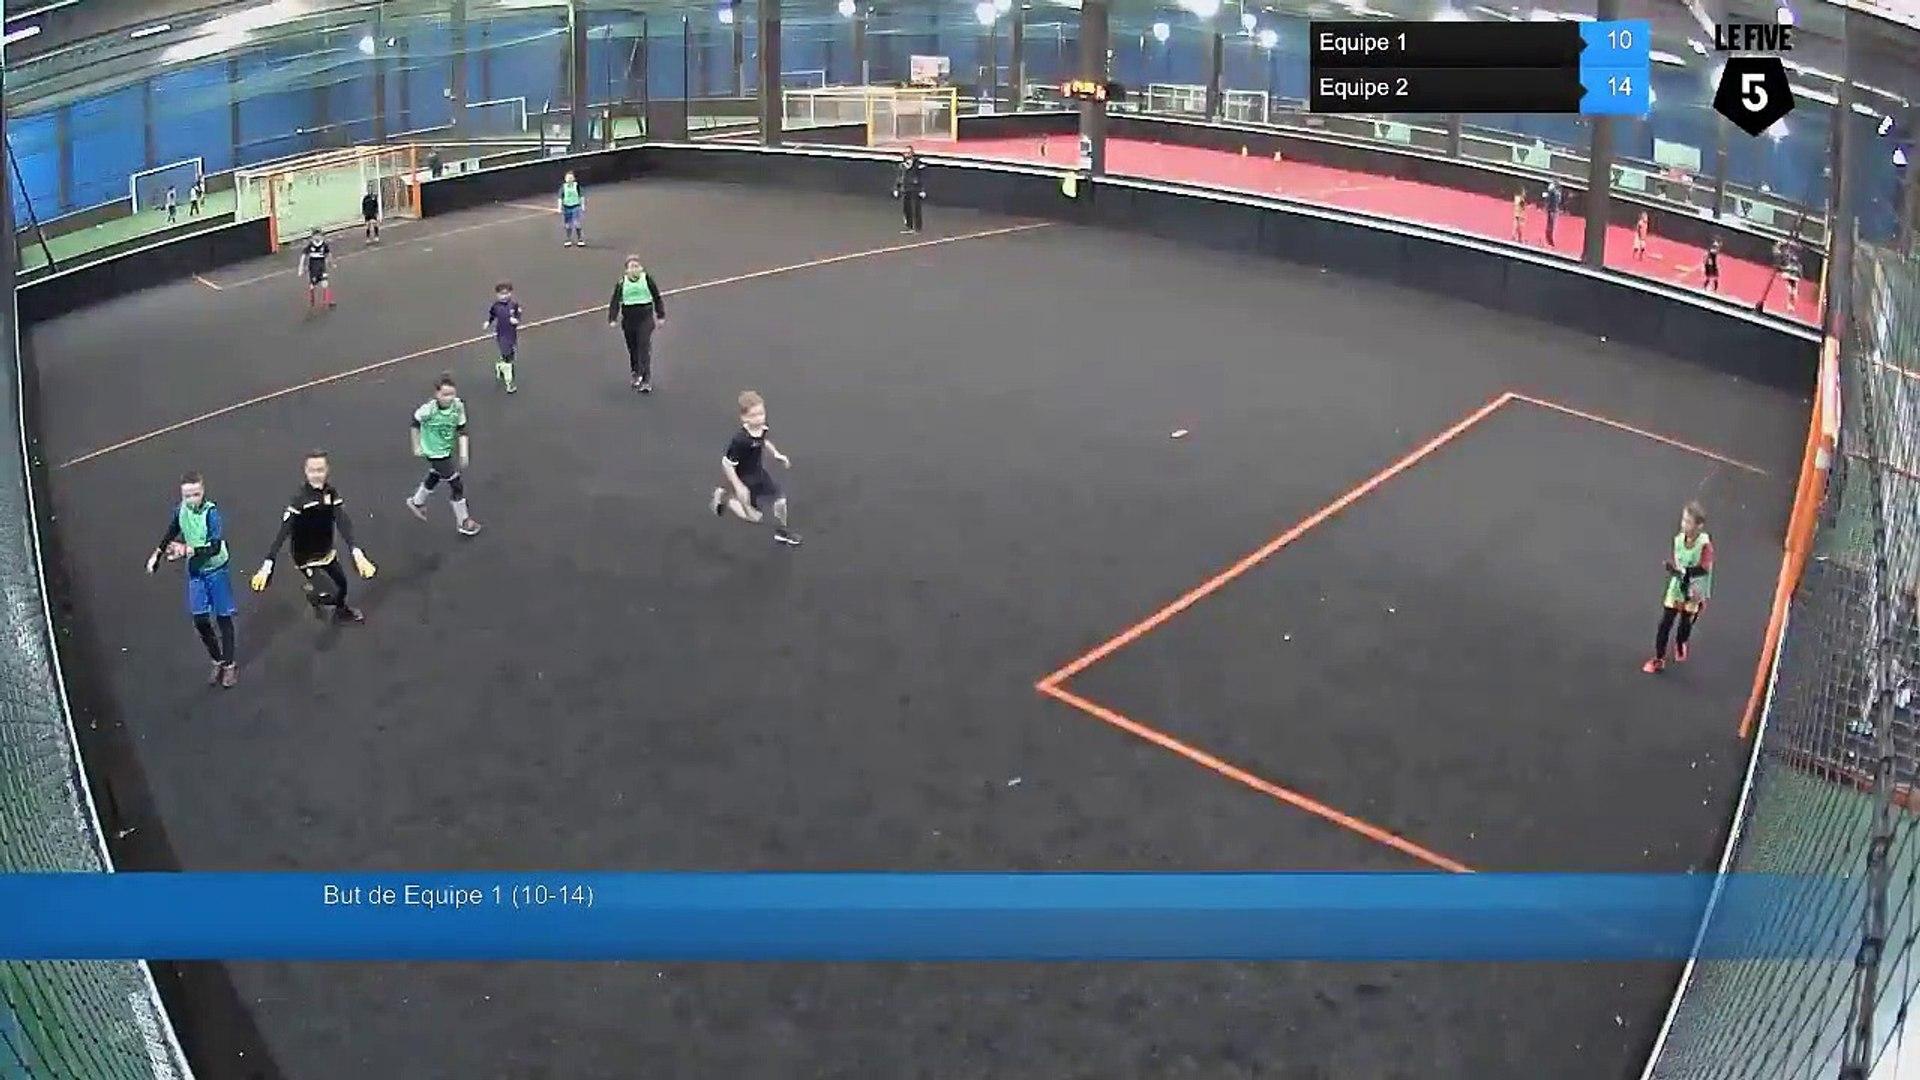 But de Equipe 1 (10-14) - Equipe 1 Vs Equipe 2 - 14/02/19 14:49 - Loisir Lens (LeFive)